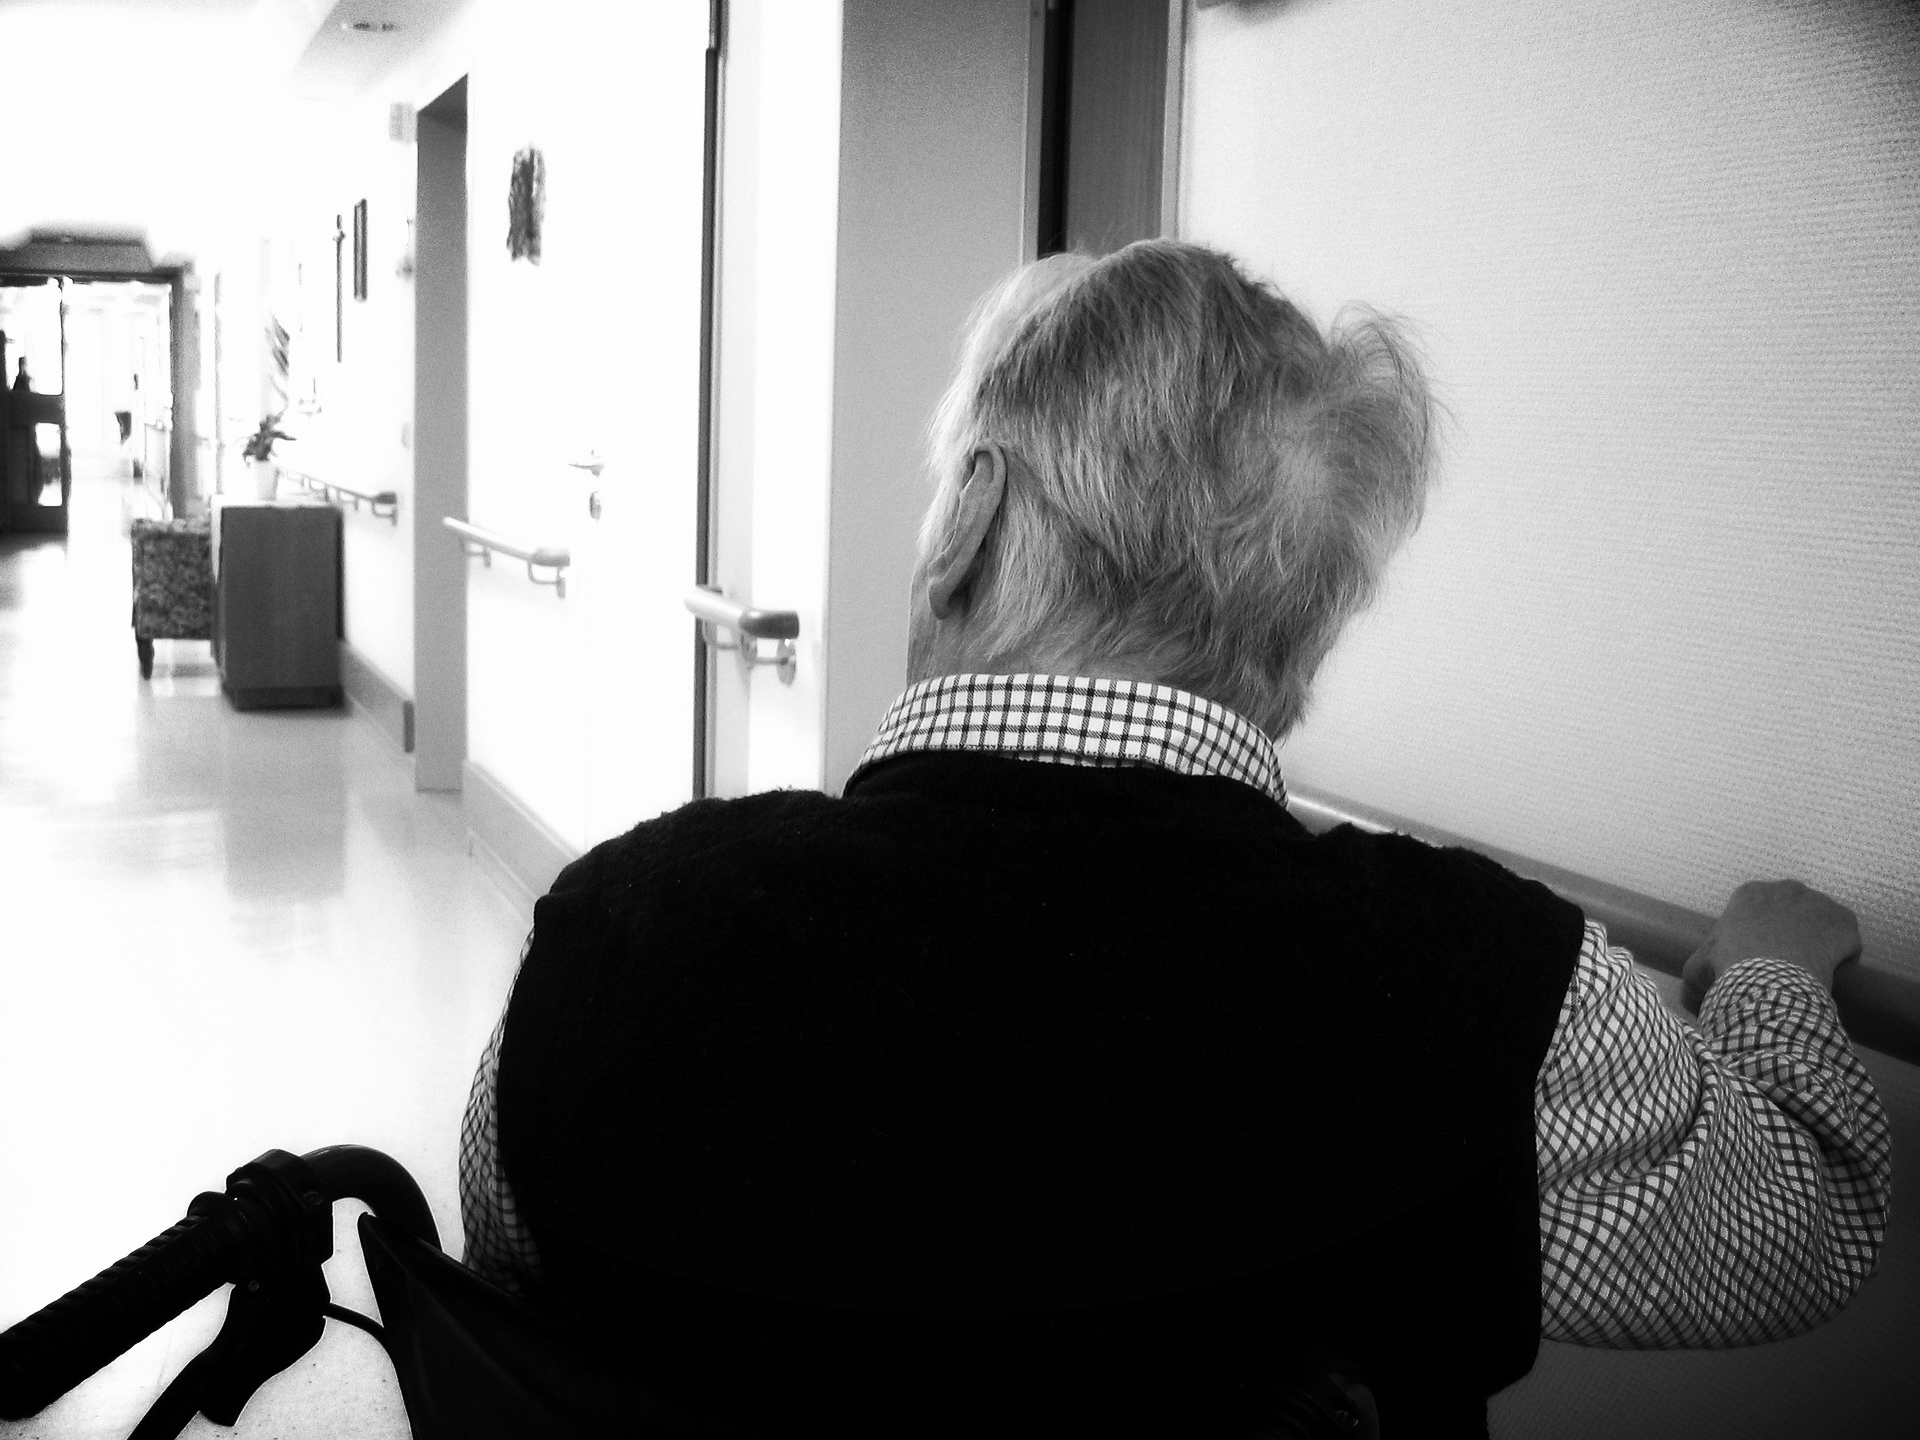 Chicago nursing home malpractice attorneys